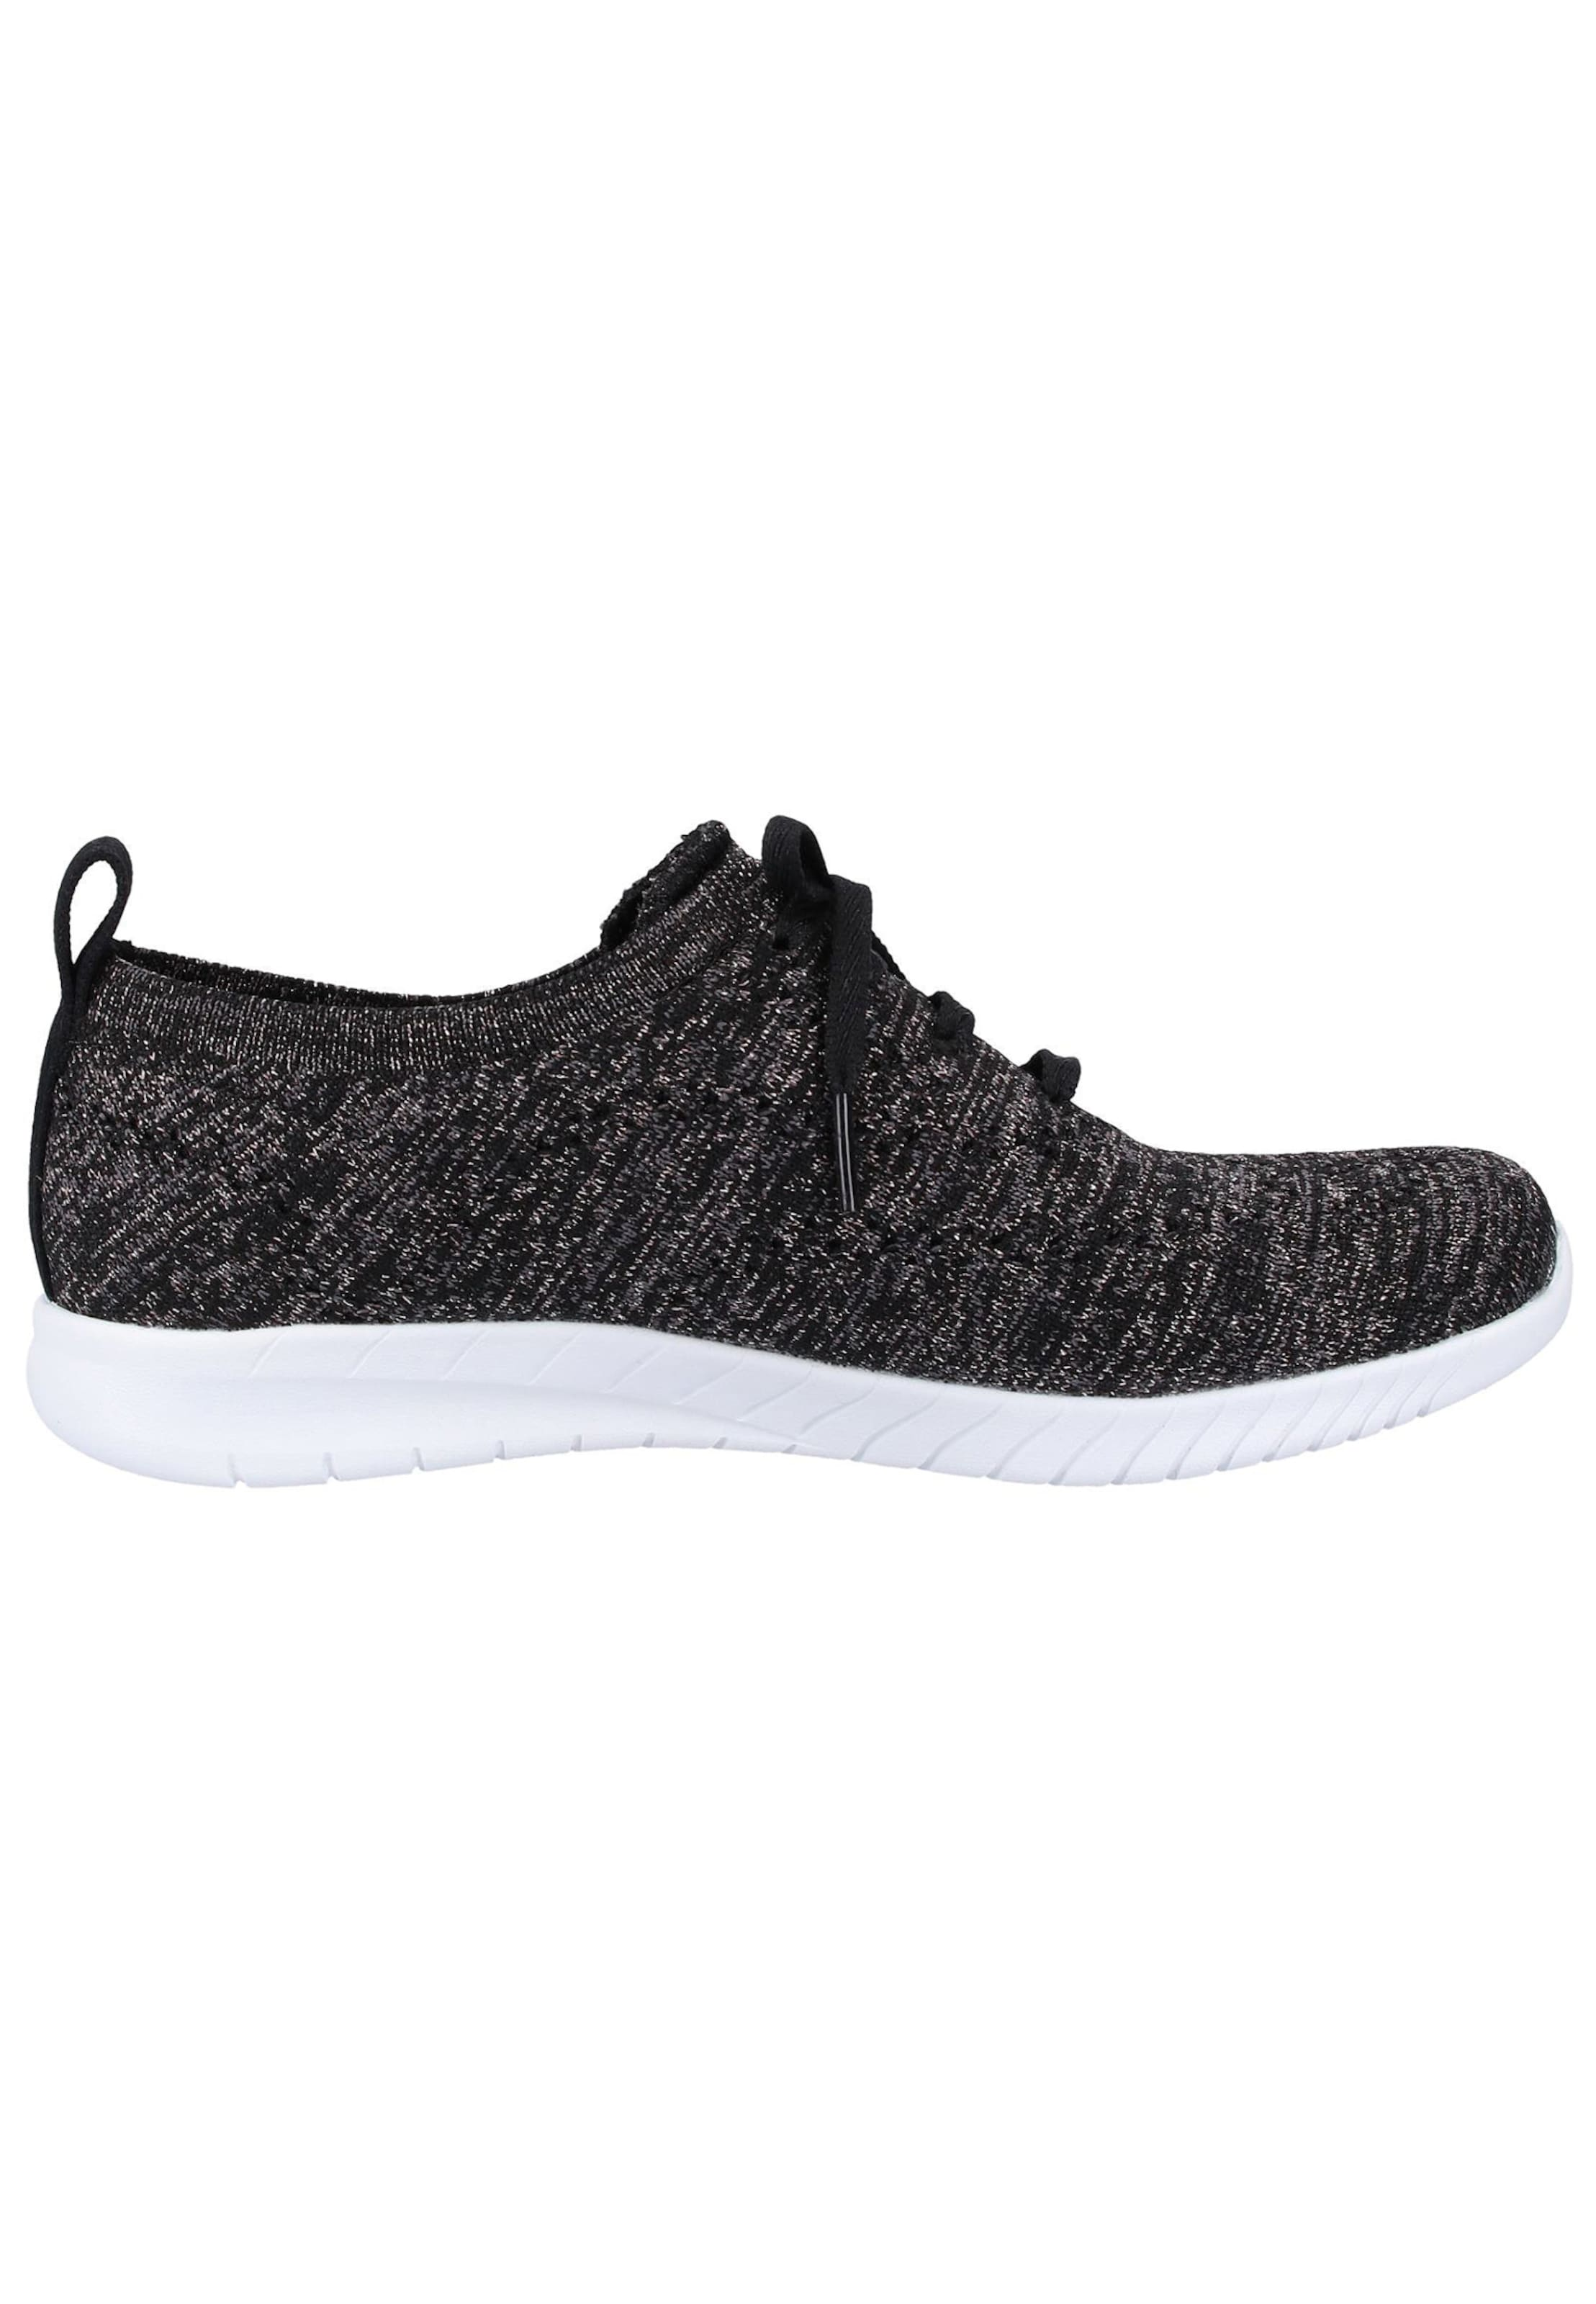 Noir Basses En Skechers Baskets Chiné mwOvNn0y8P